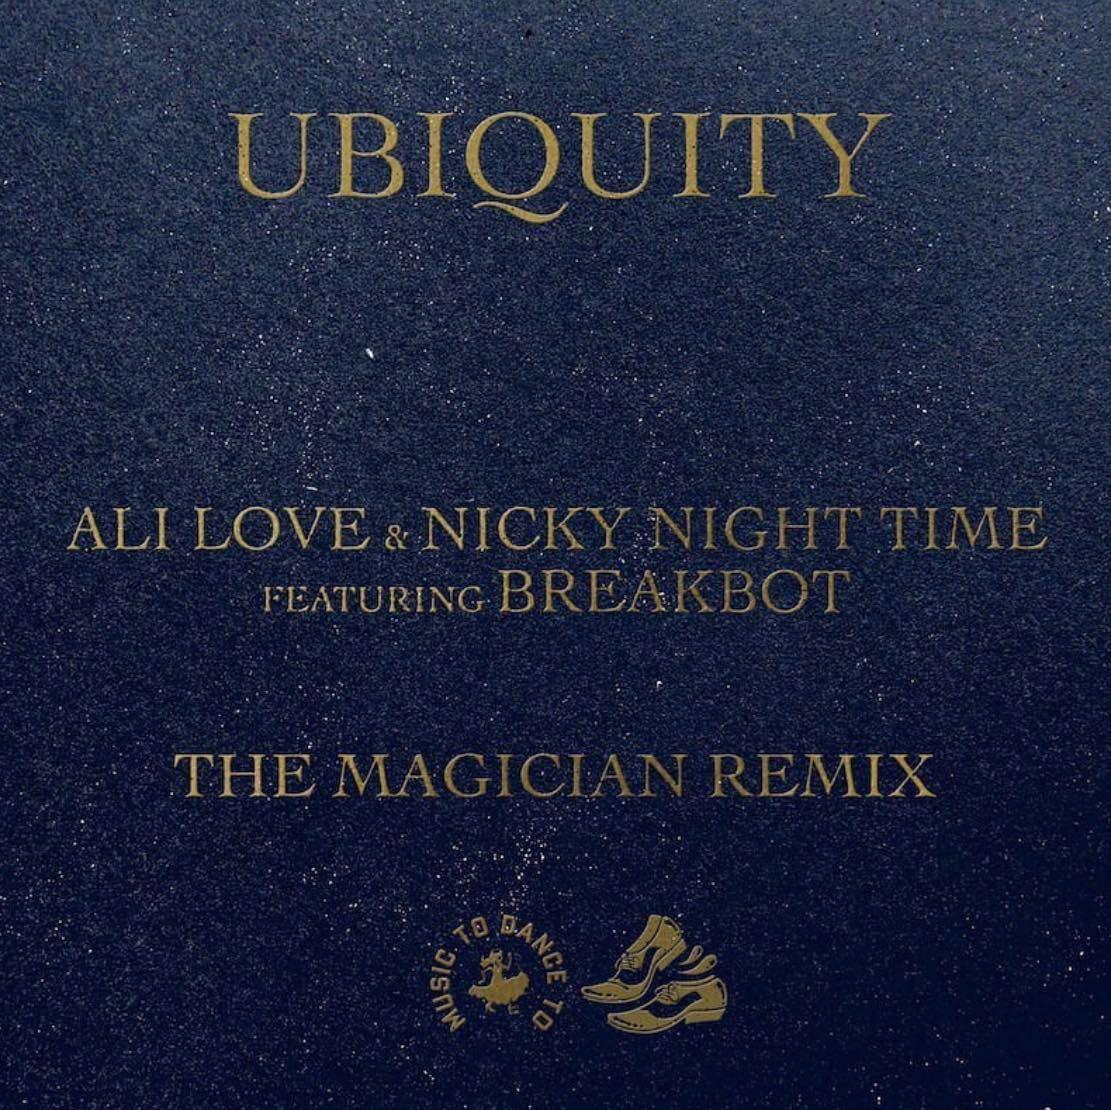 Ubiquity (The Magician Remix)